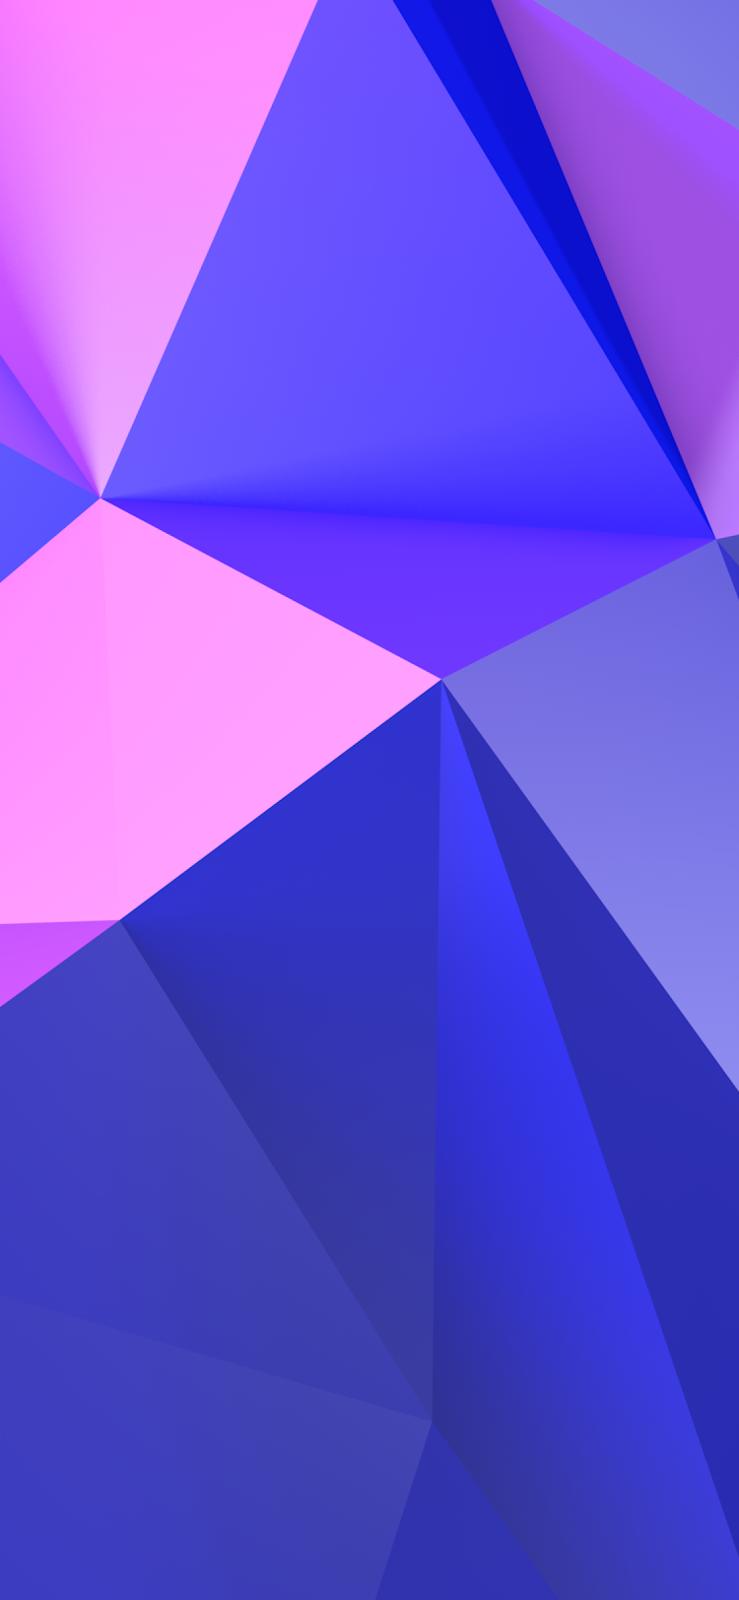 iPhone X 高解析度幾何幻想桌布下載 | 愛瘋日報